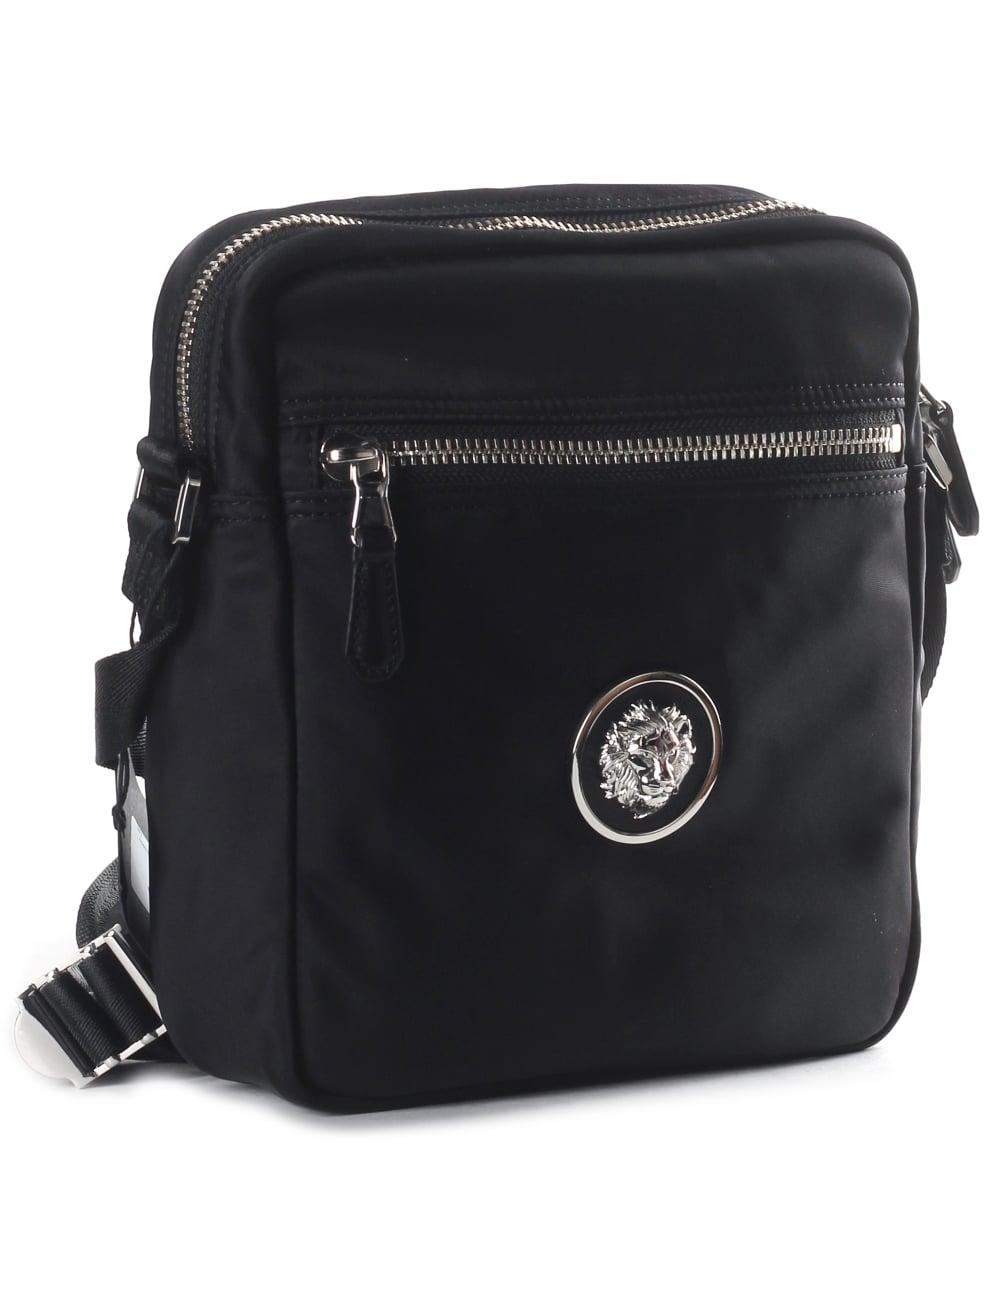 9f052fb6 Versus Versace Small Lion Head Men's Messenger Bag